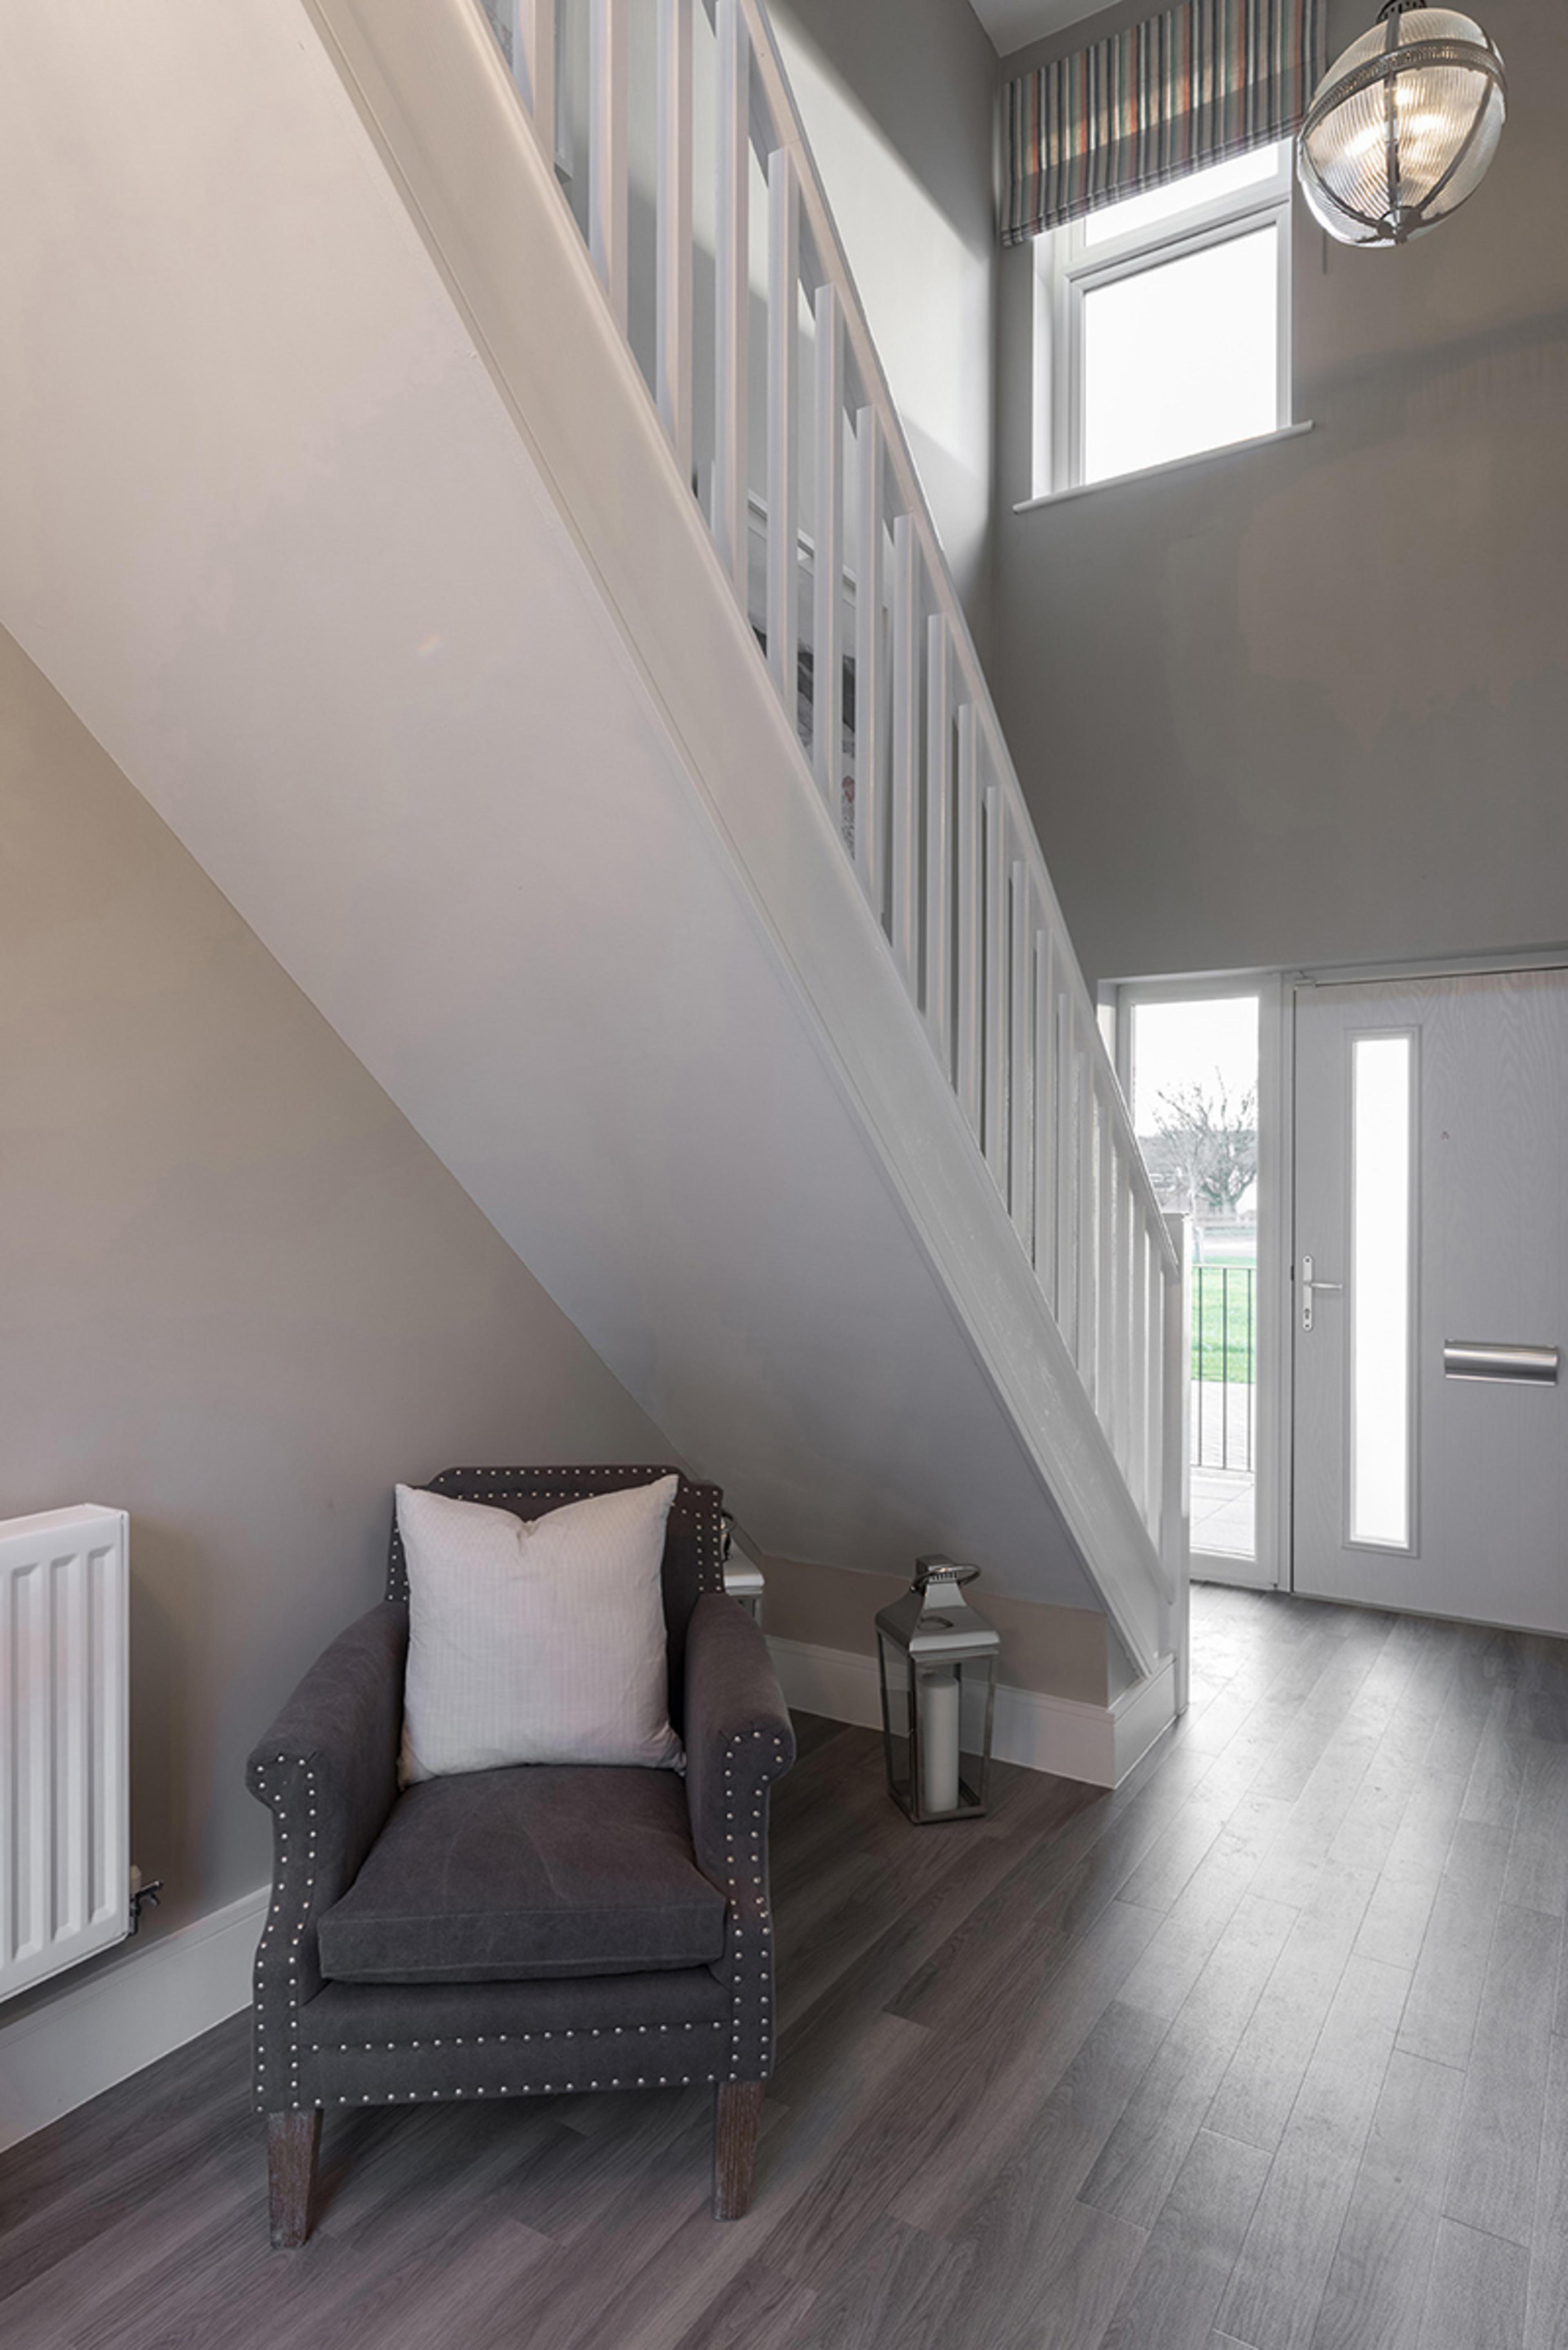 watling-grange-harrogate-calder-3-bed-home-under-stairs-portrait-1